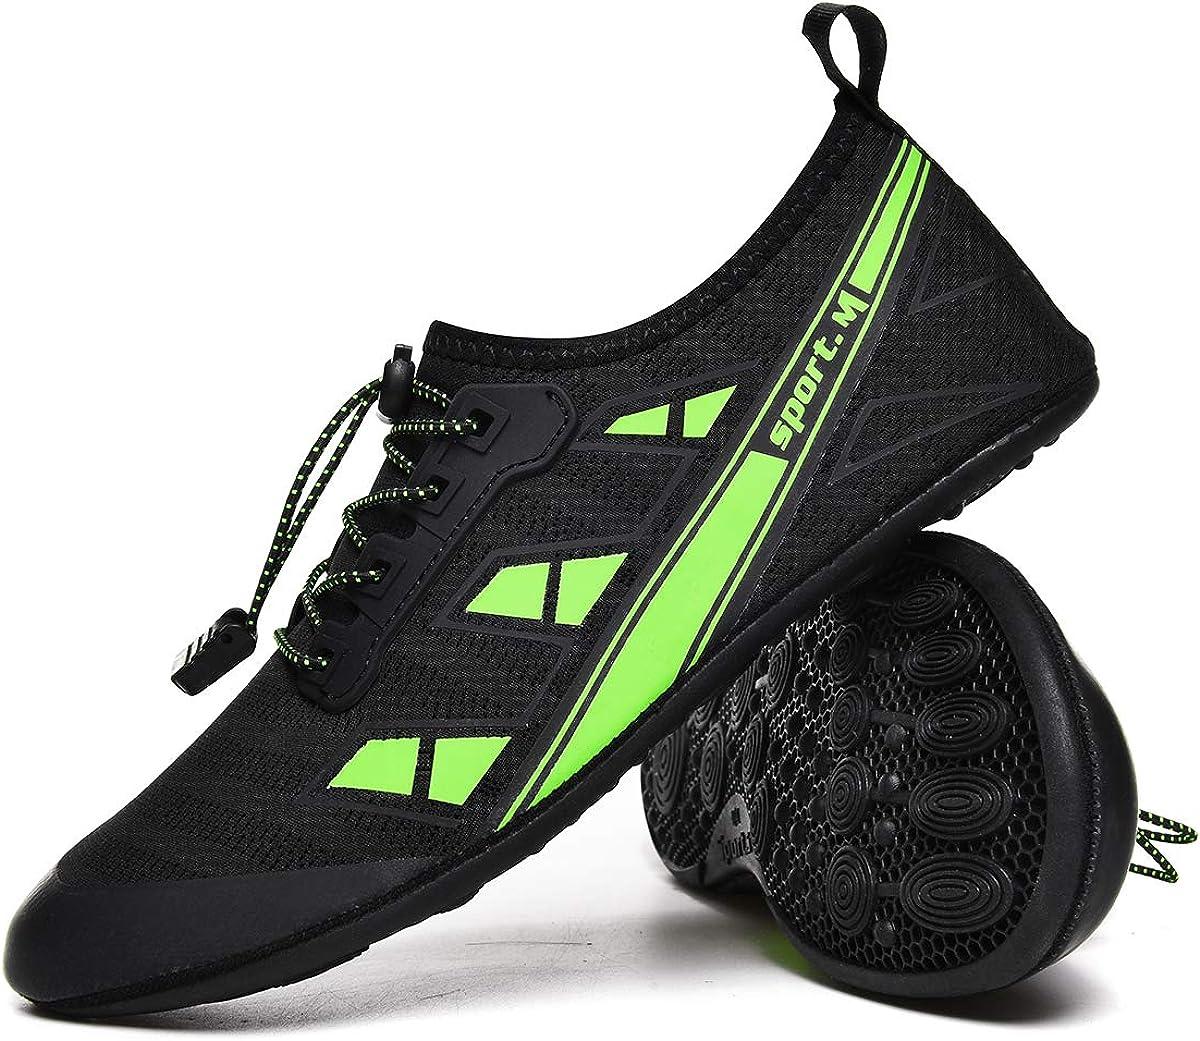 Kedeame Adjustable Elastic Slip-on Water Shoes Barefoot Quick-Dry Yoga Socks for Womens Mens